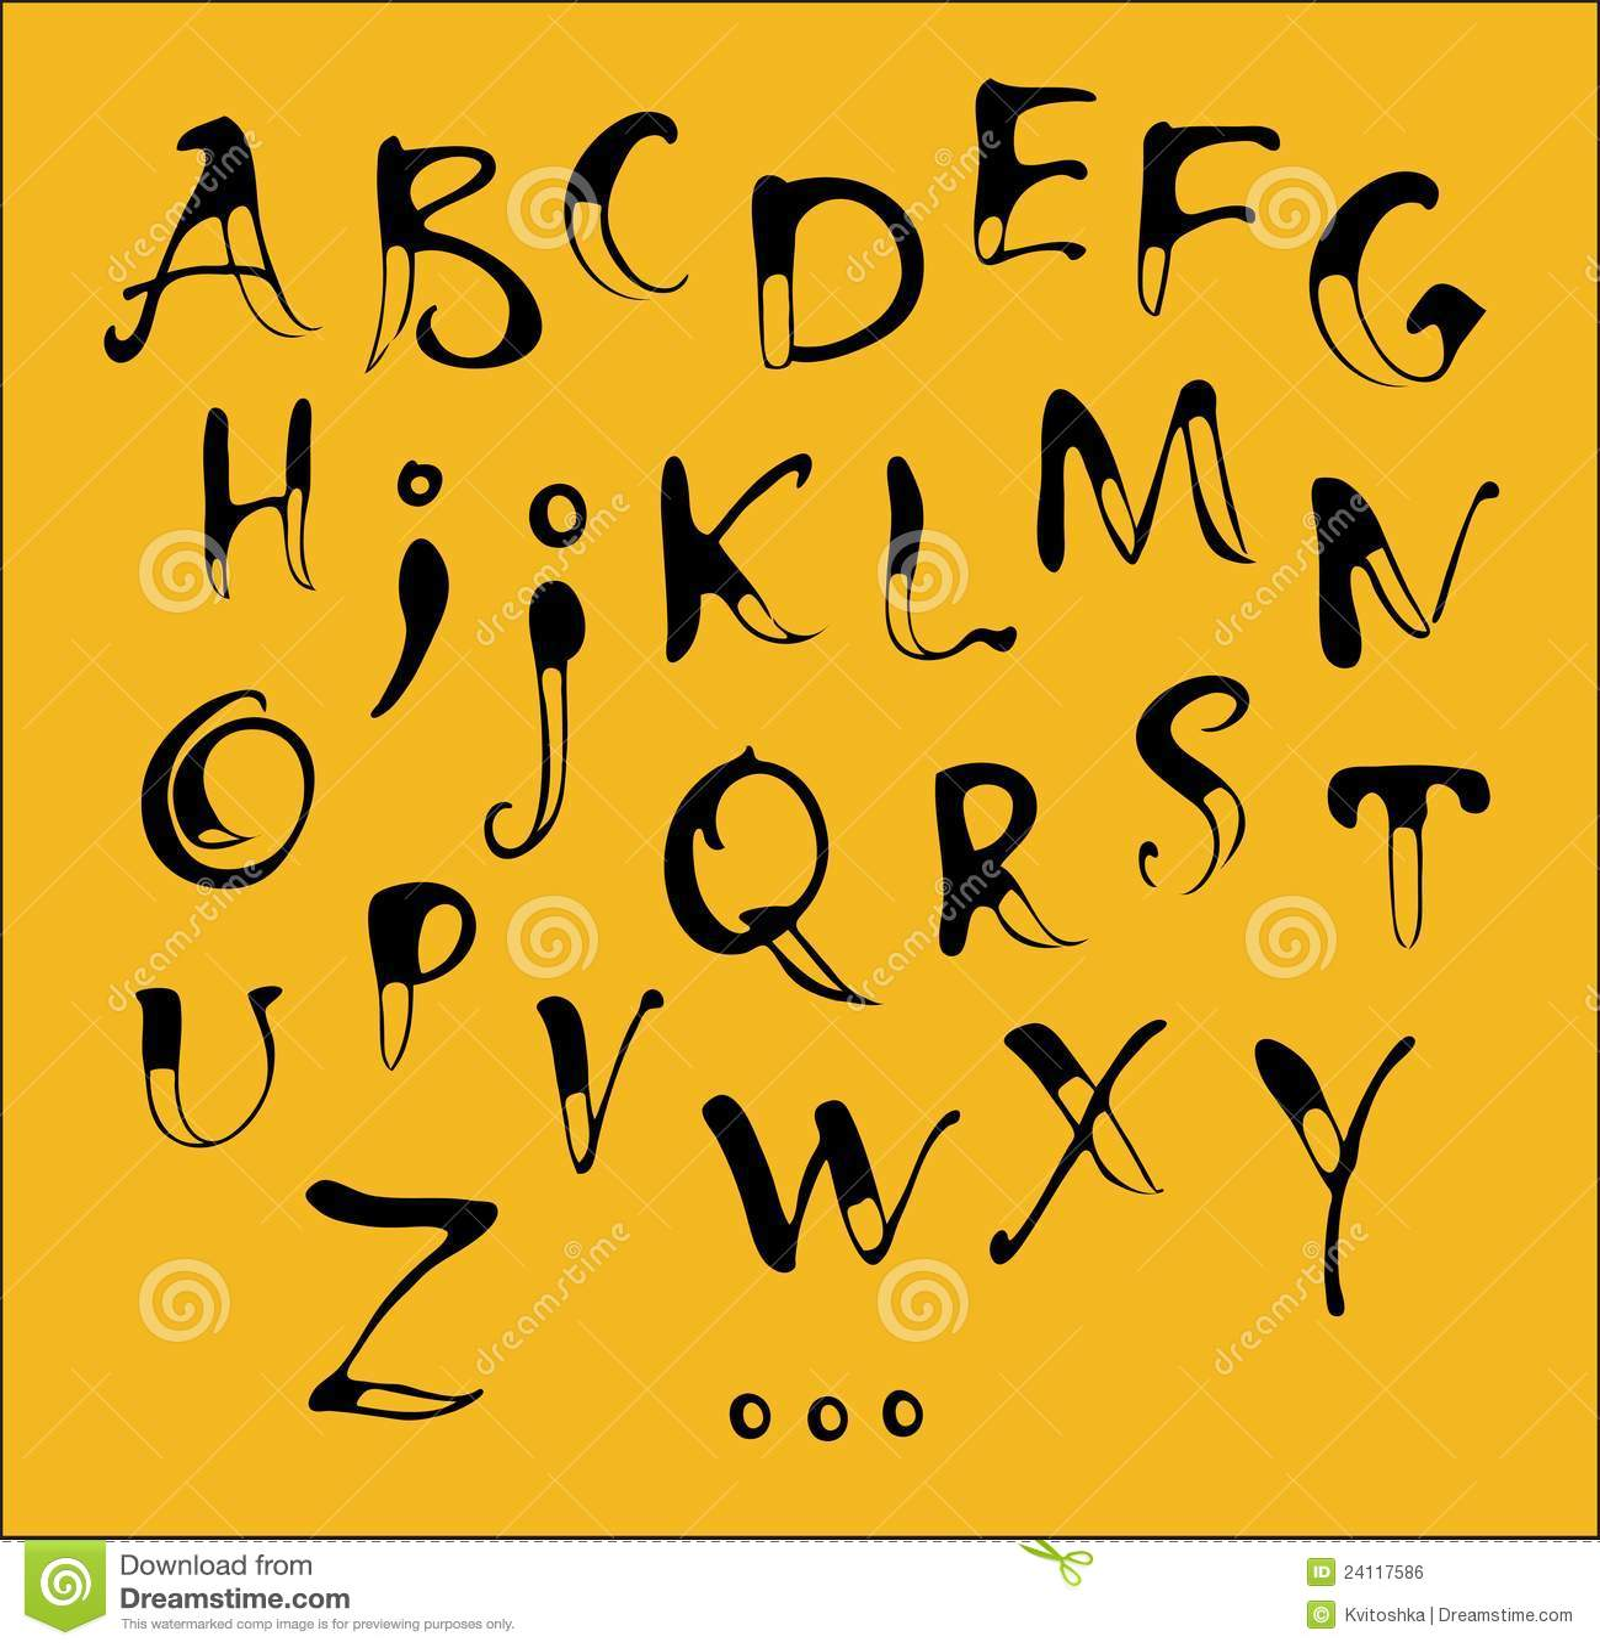 Calligraphy Alphabet Royalty Free Stock Image - Image: 24117586